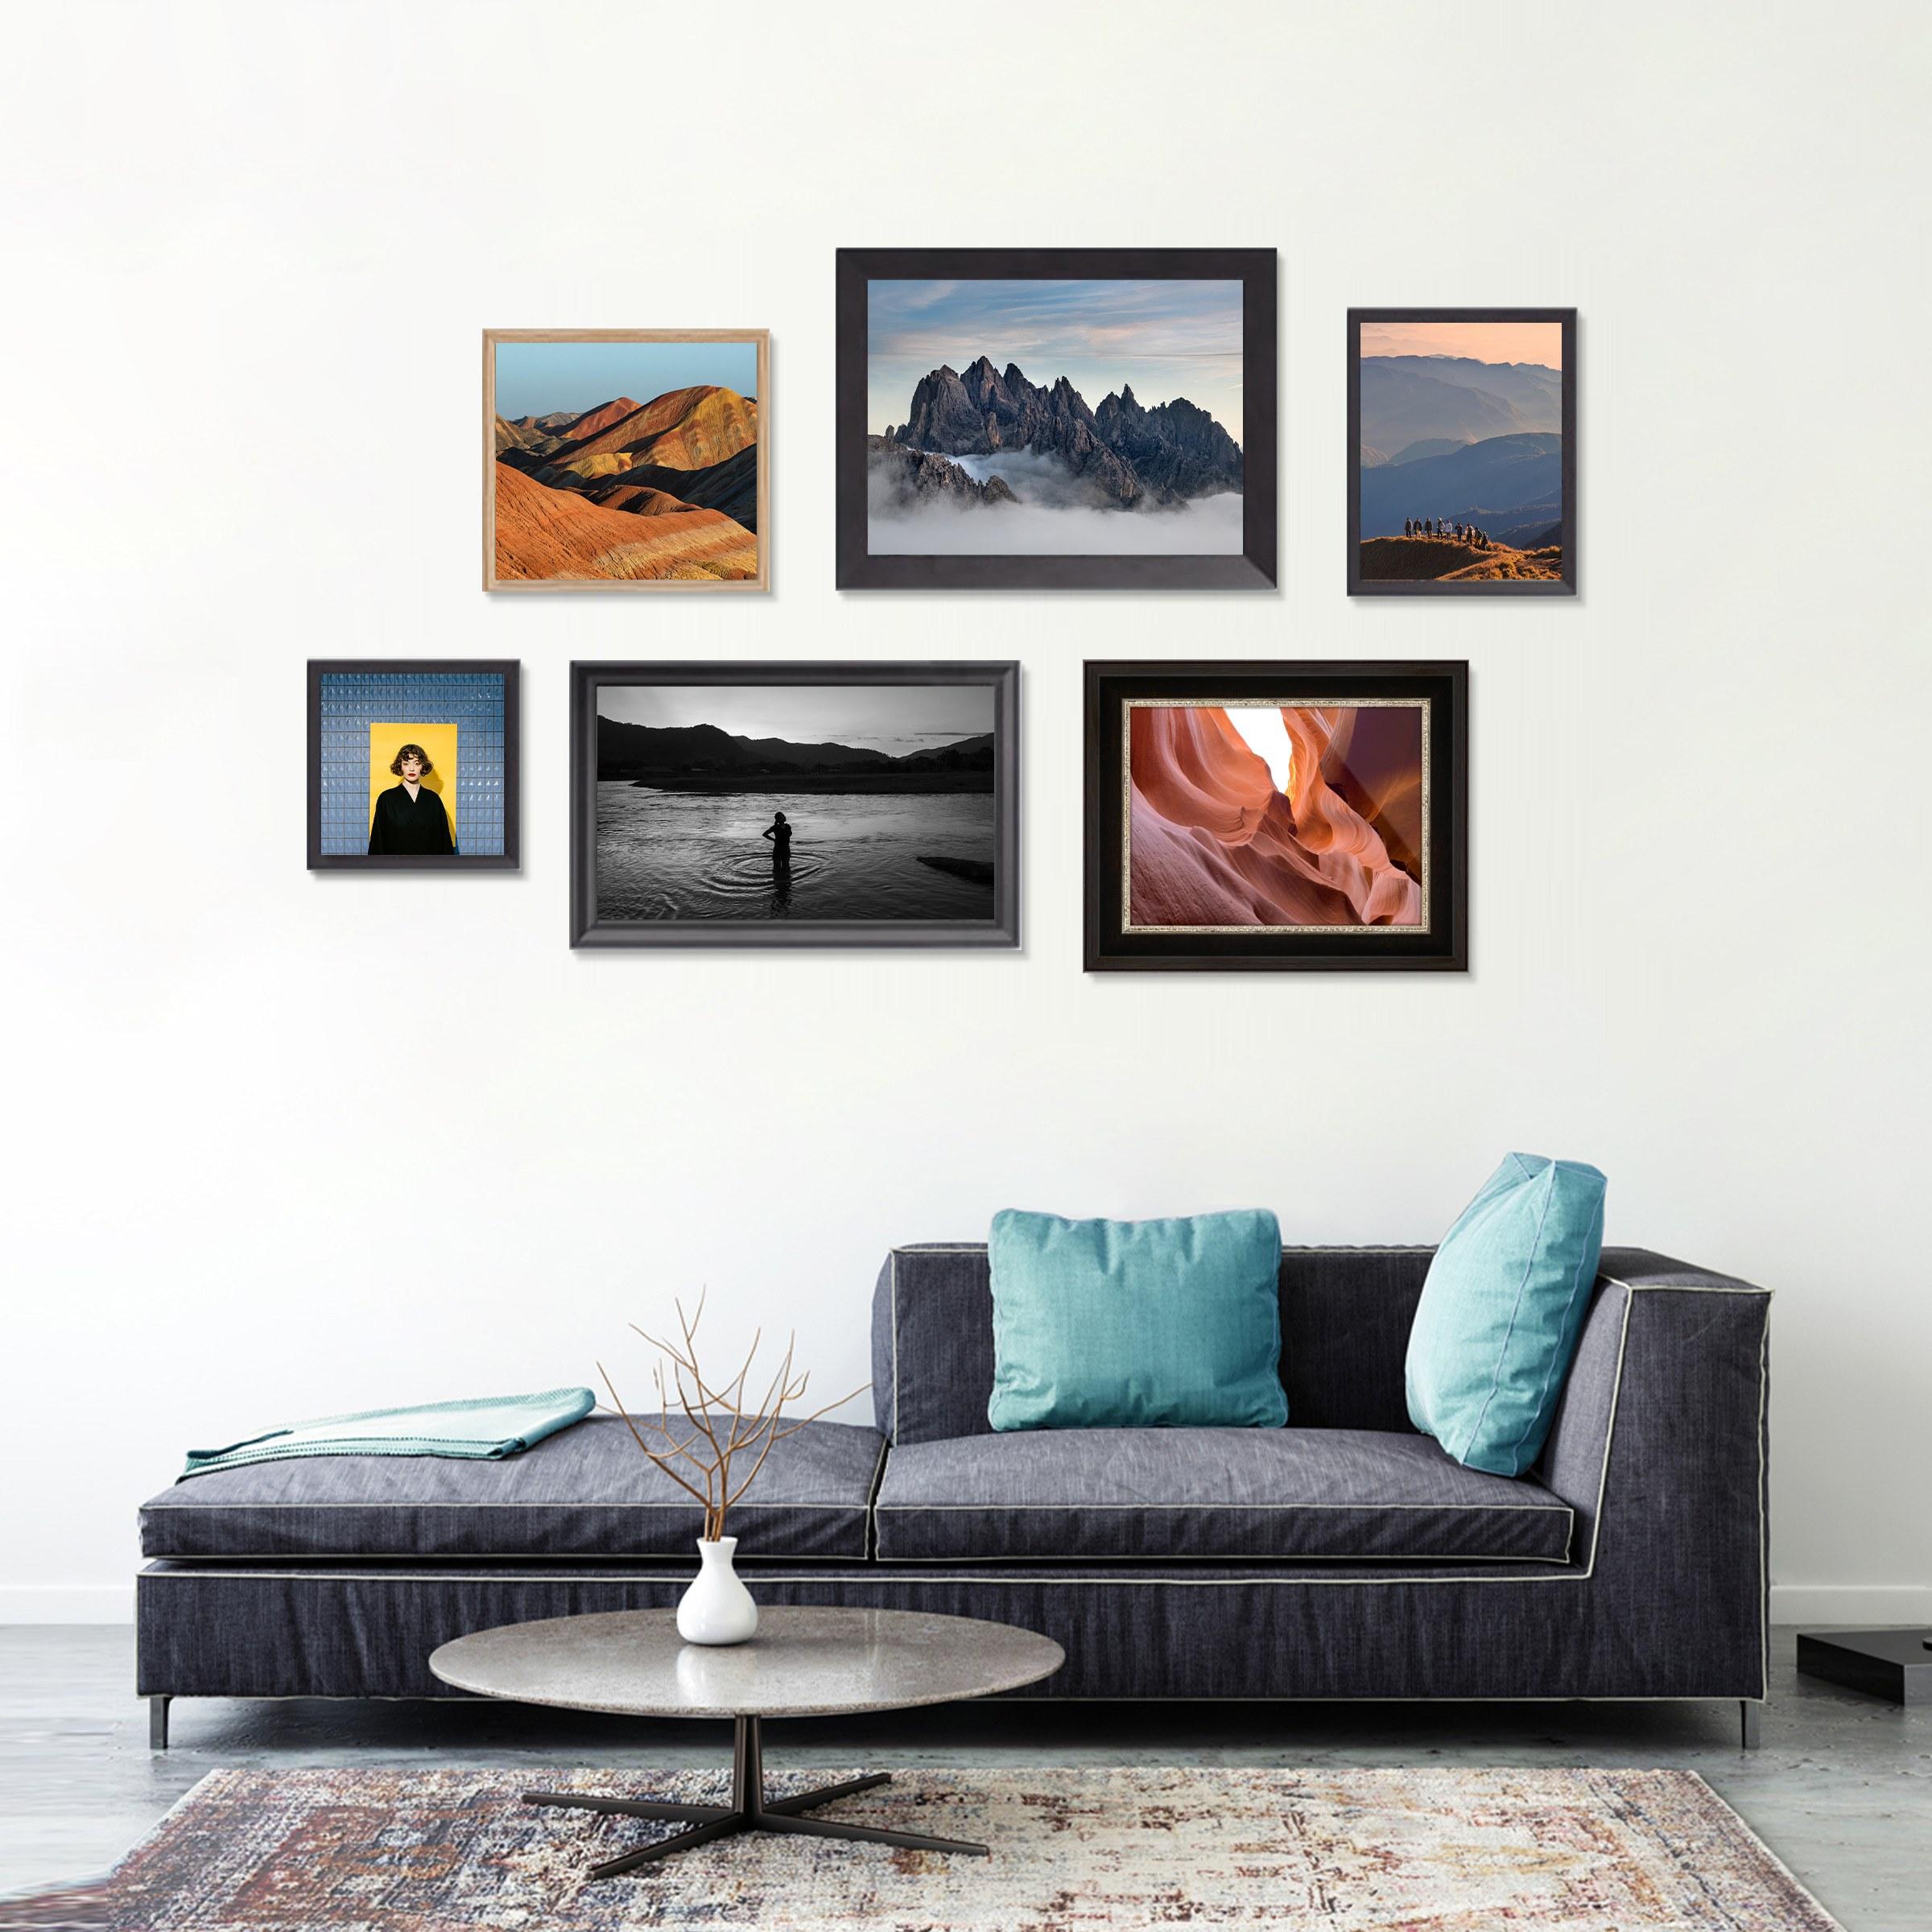 foto-im-holzrahmen-landschaft-inspiration-1200x1200 (1).jpg